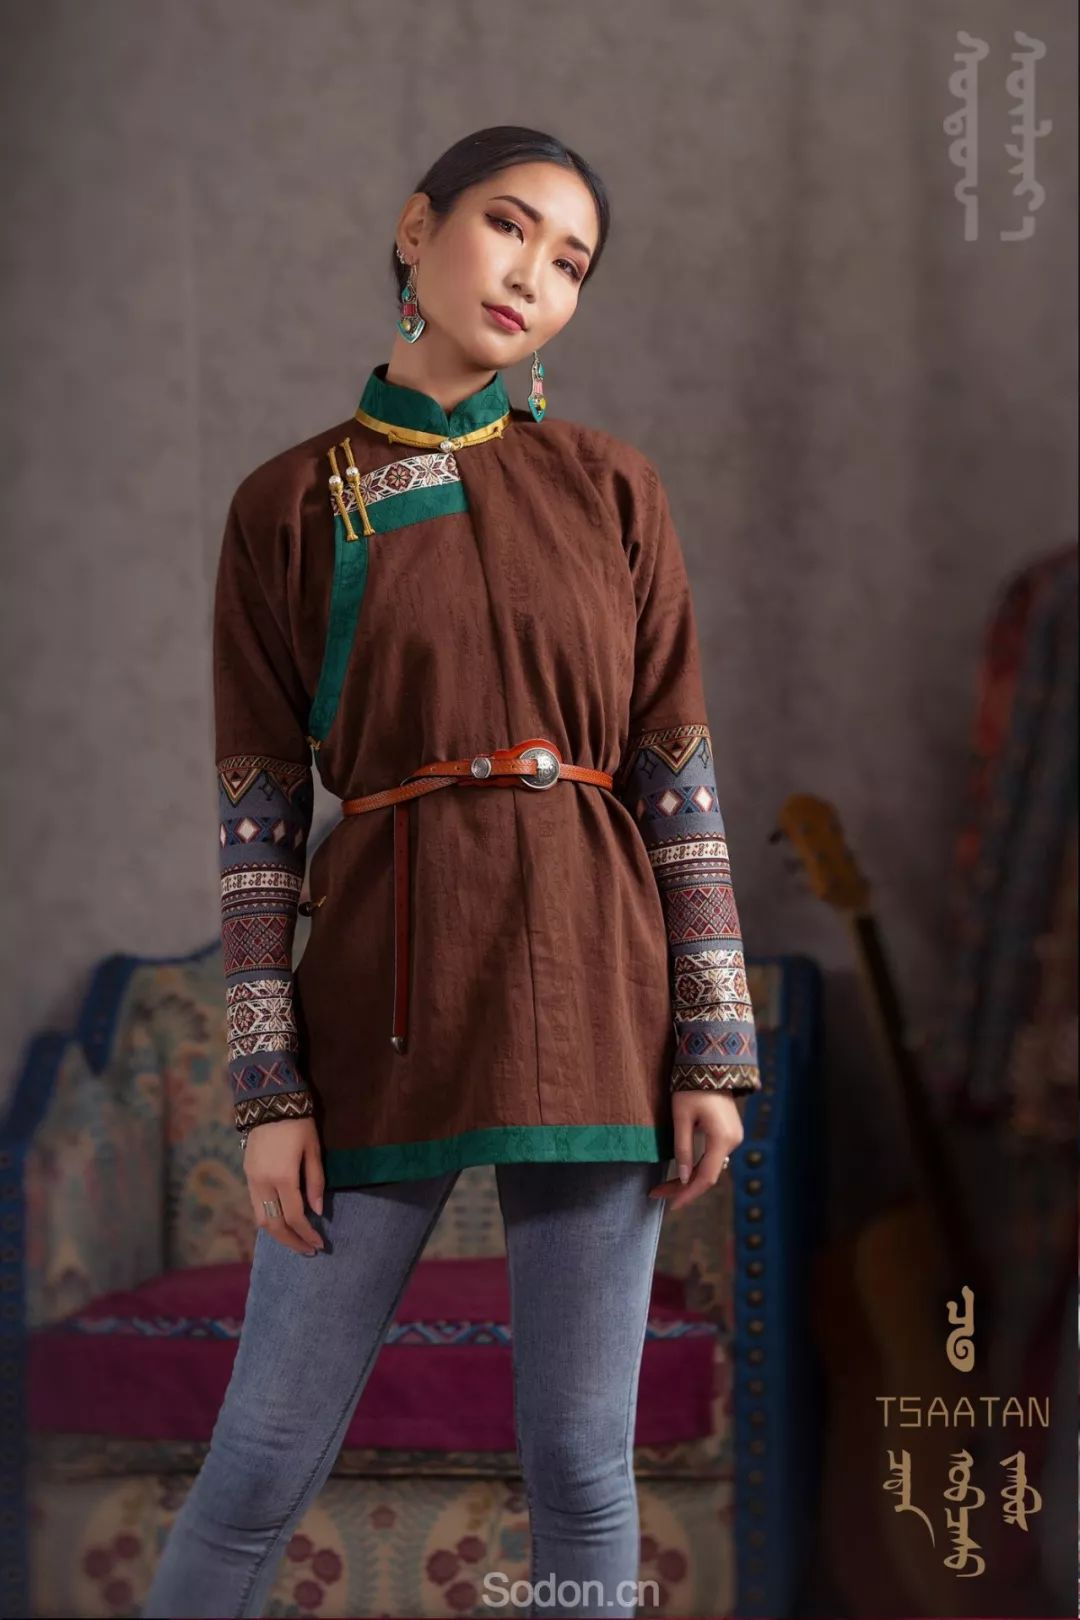 TSAATAN蒙古时装秋冬系列,来自驯鹿人的独特魅力! 第62张